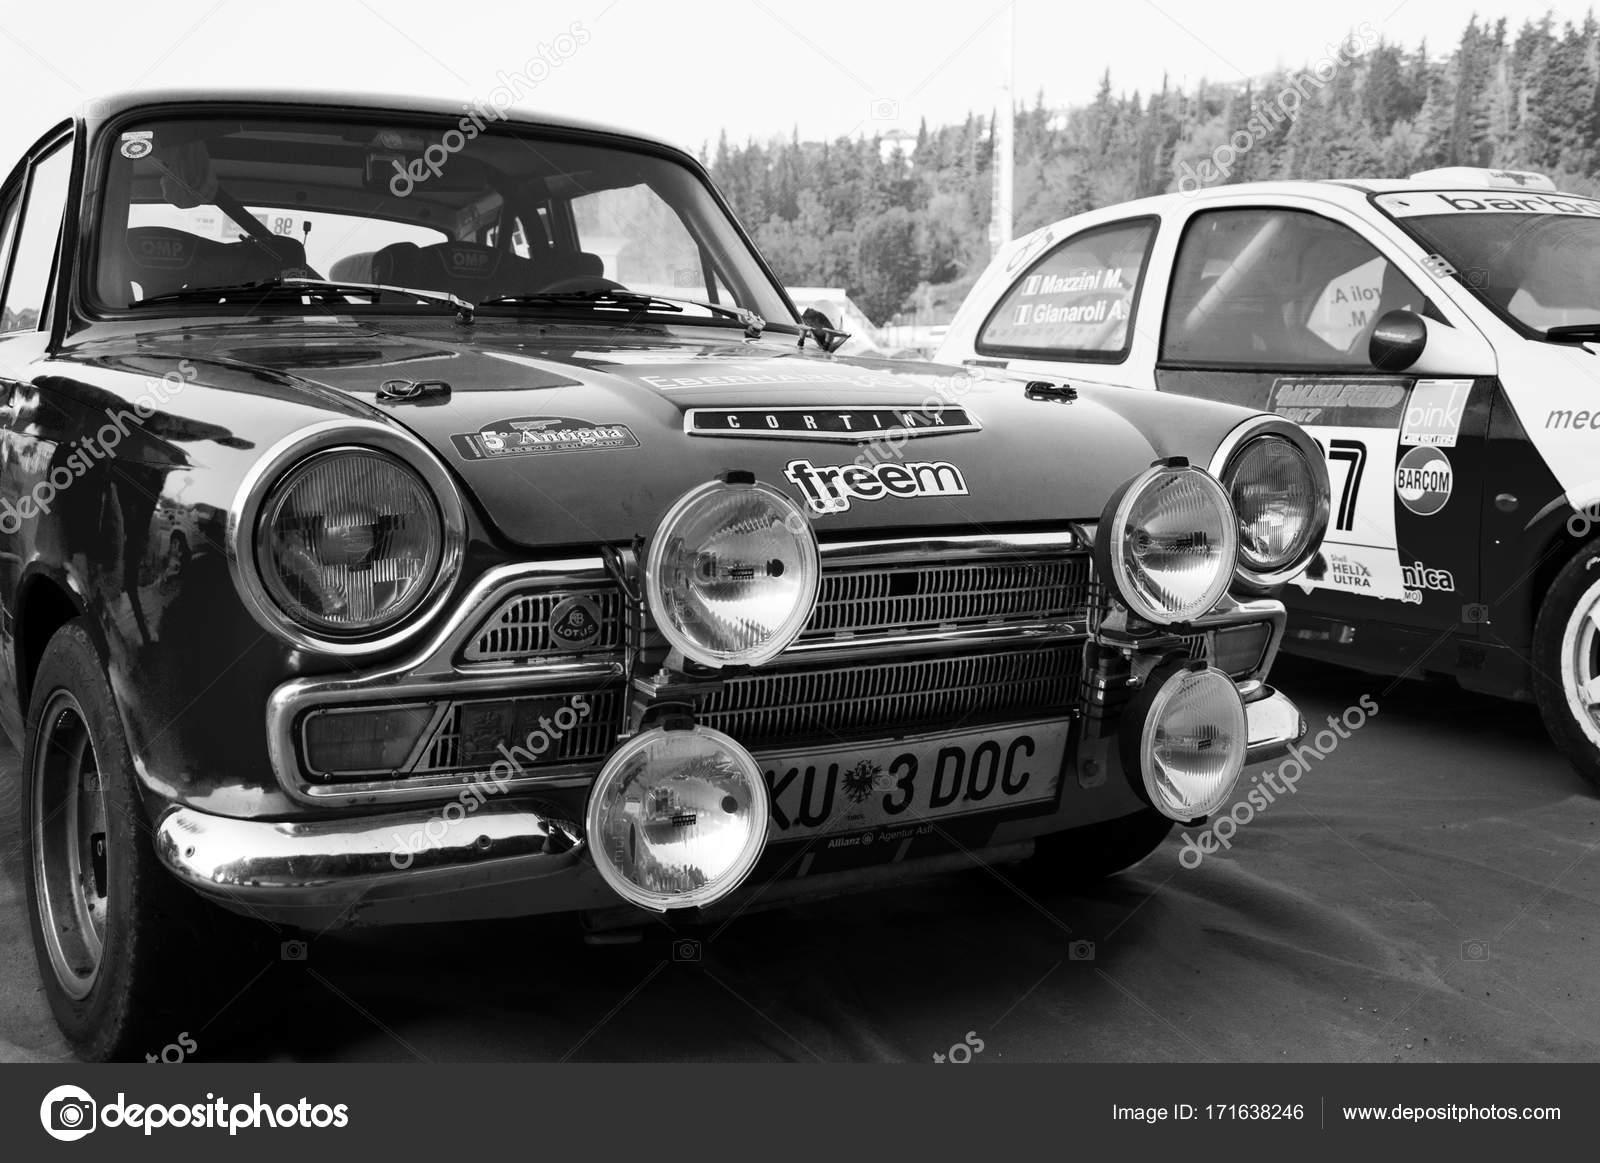 FORD LOTUS CORTINA 1965 old racing car rally – Stock Editorial Photo